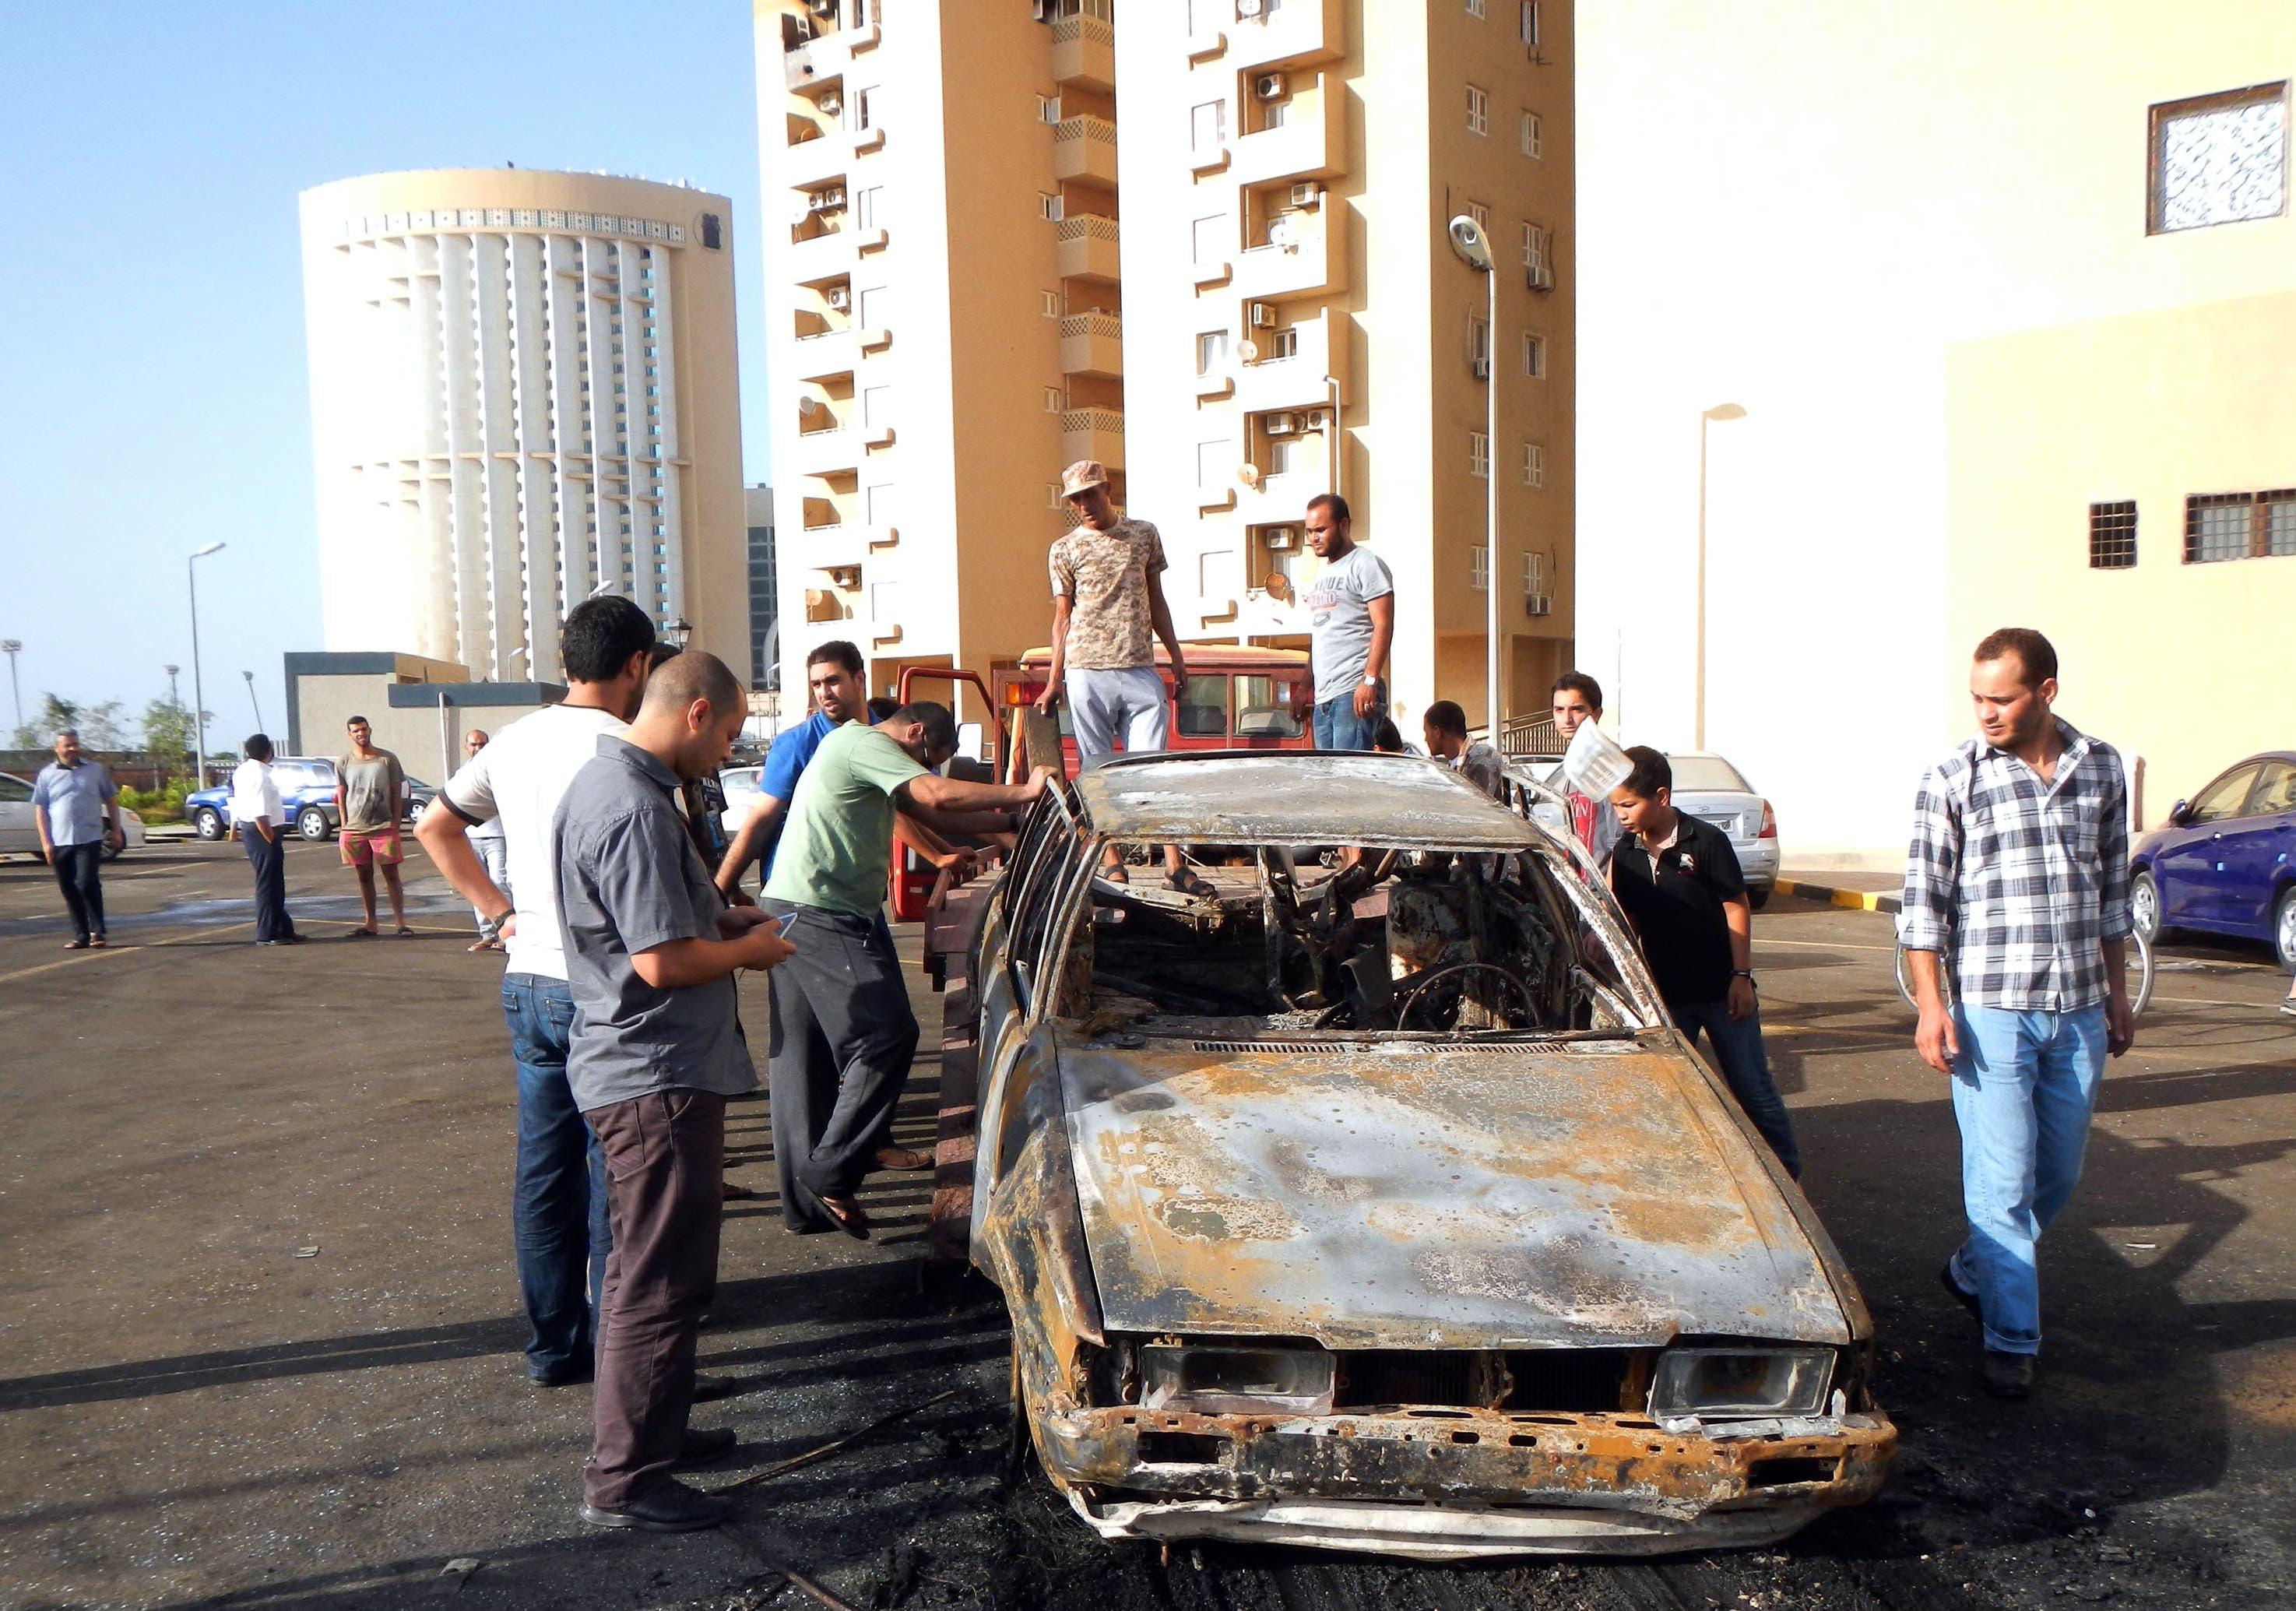 Men examine a car destroyed in a blast near embassies in Tripoli (AFP / MAHMUD TURKIA)